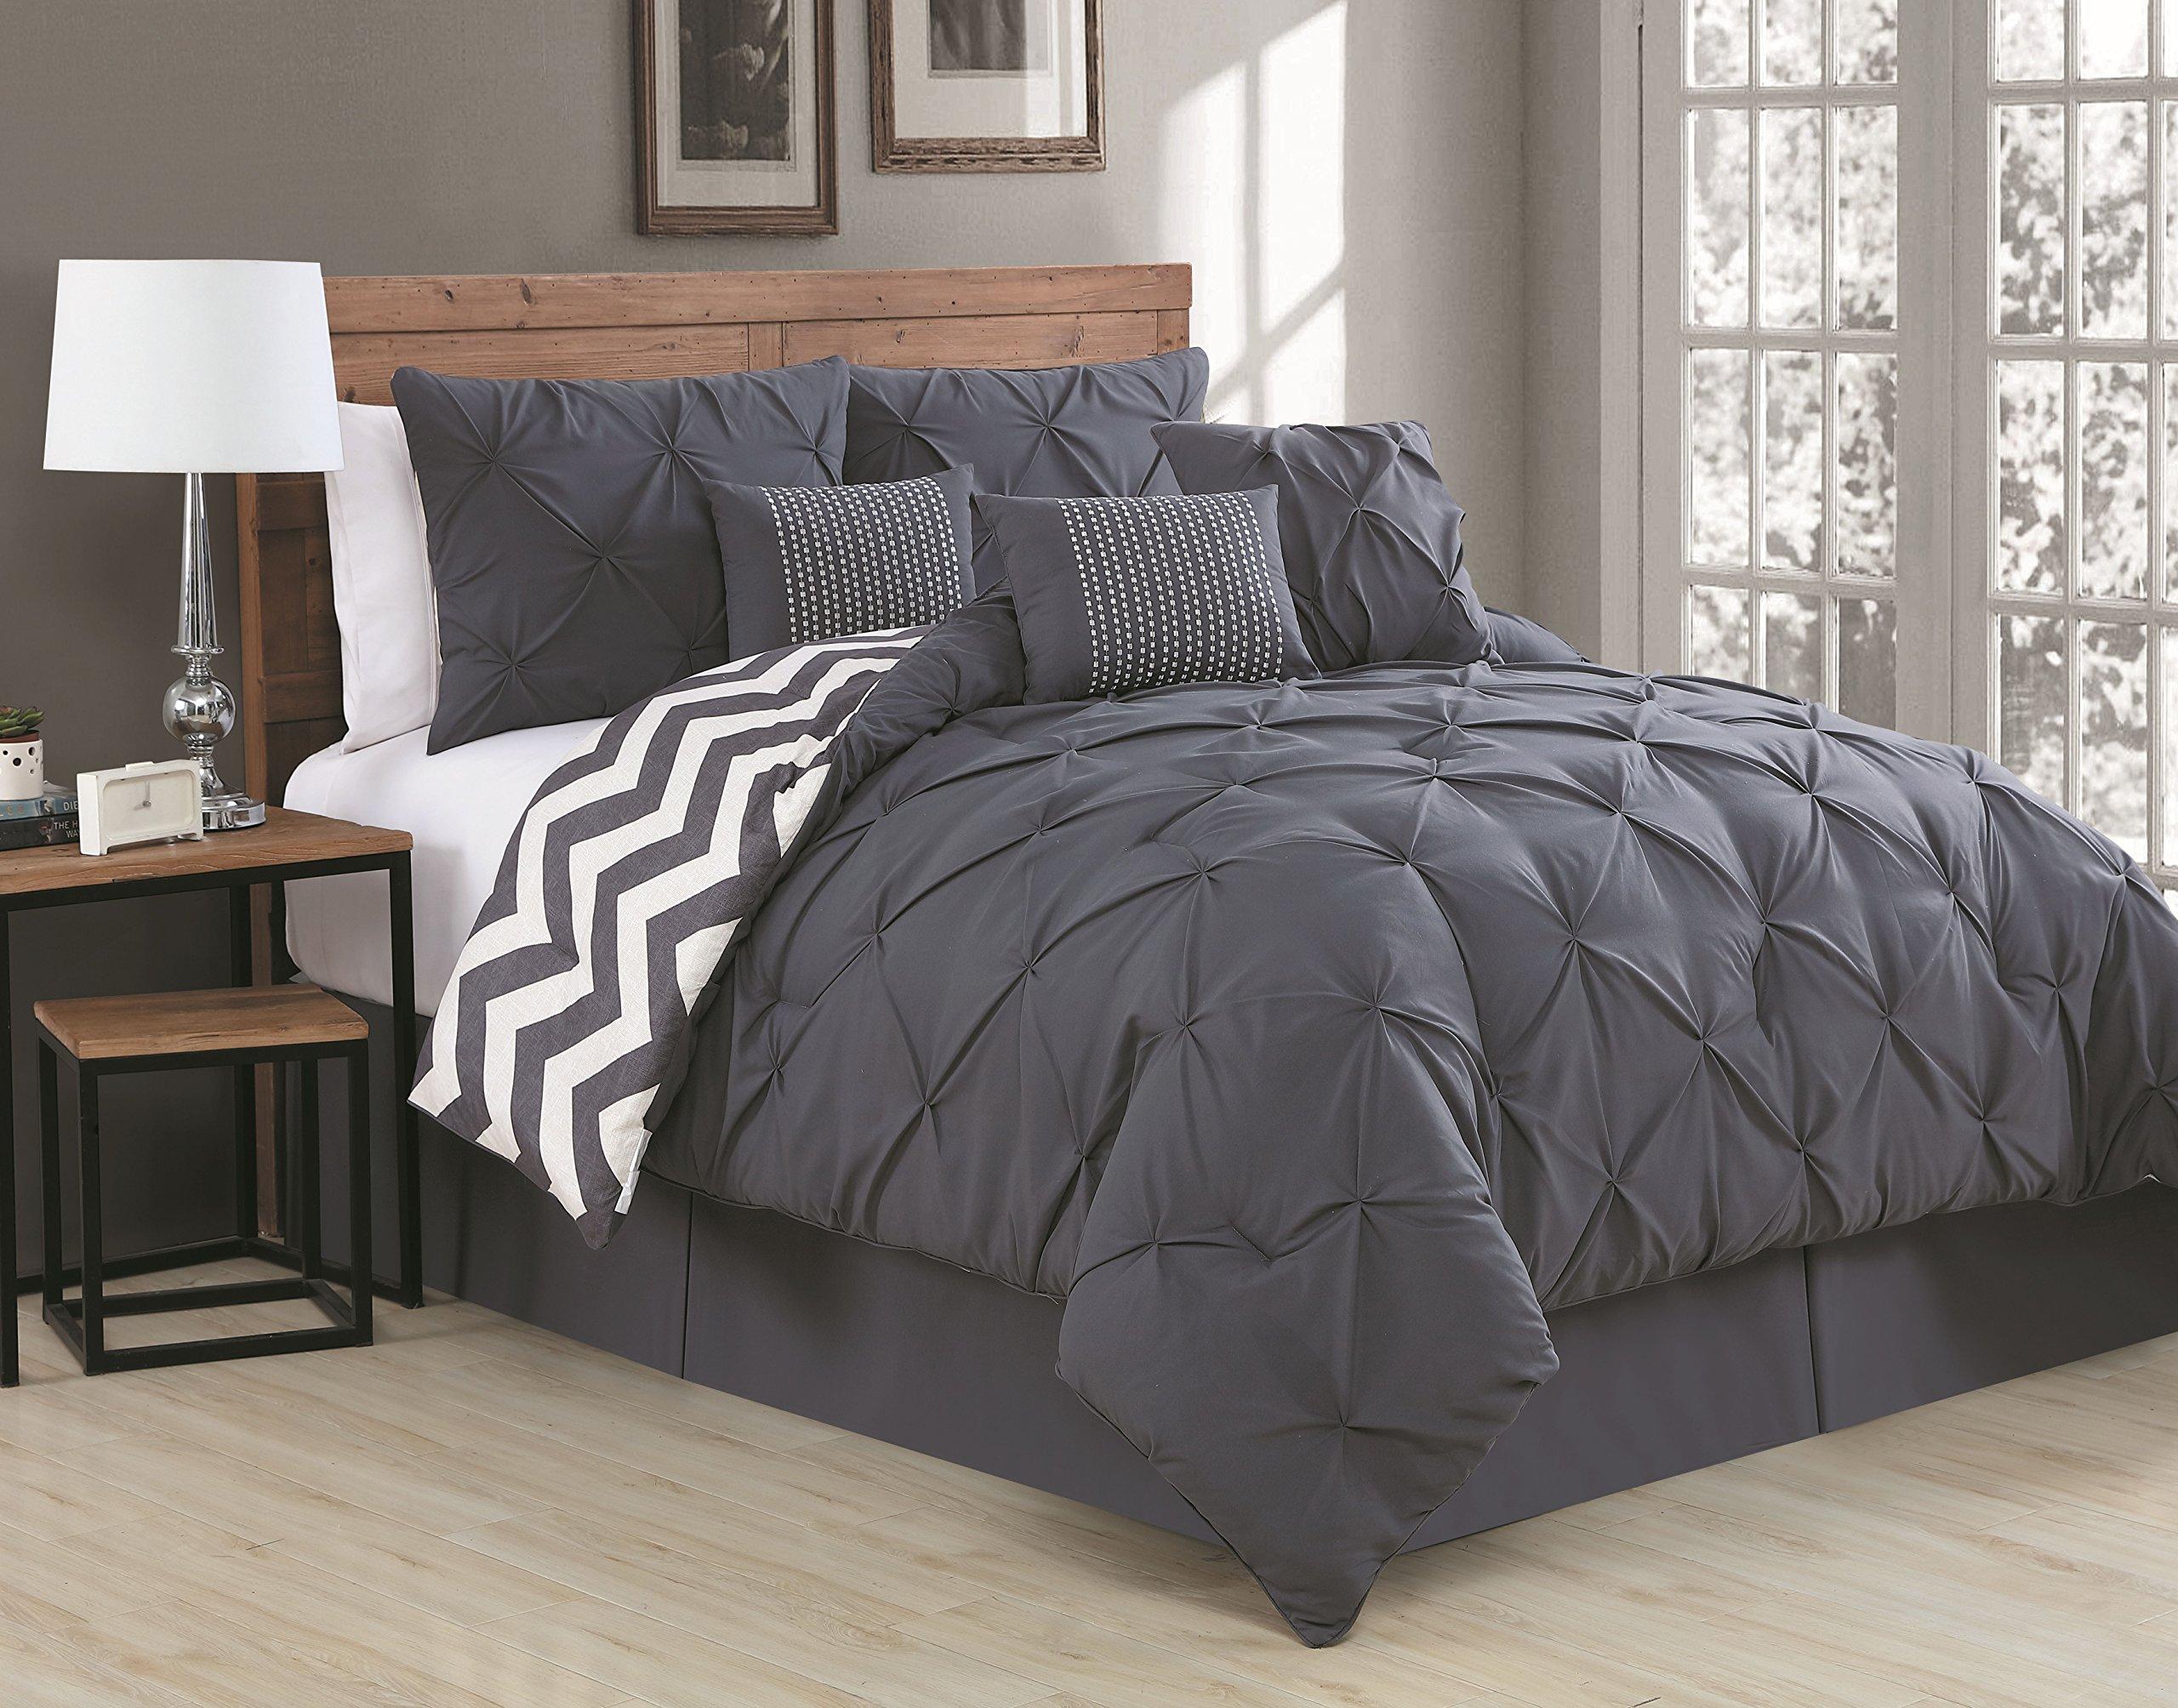 Avondale Manor 7-Piece Ella Pinch Pleat Comforter Set, Queen, Charcoal